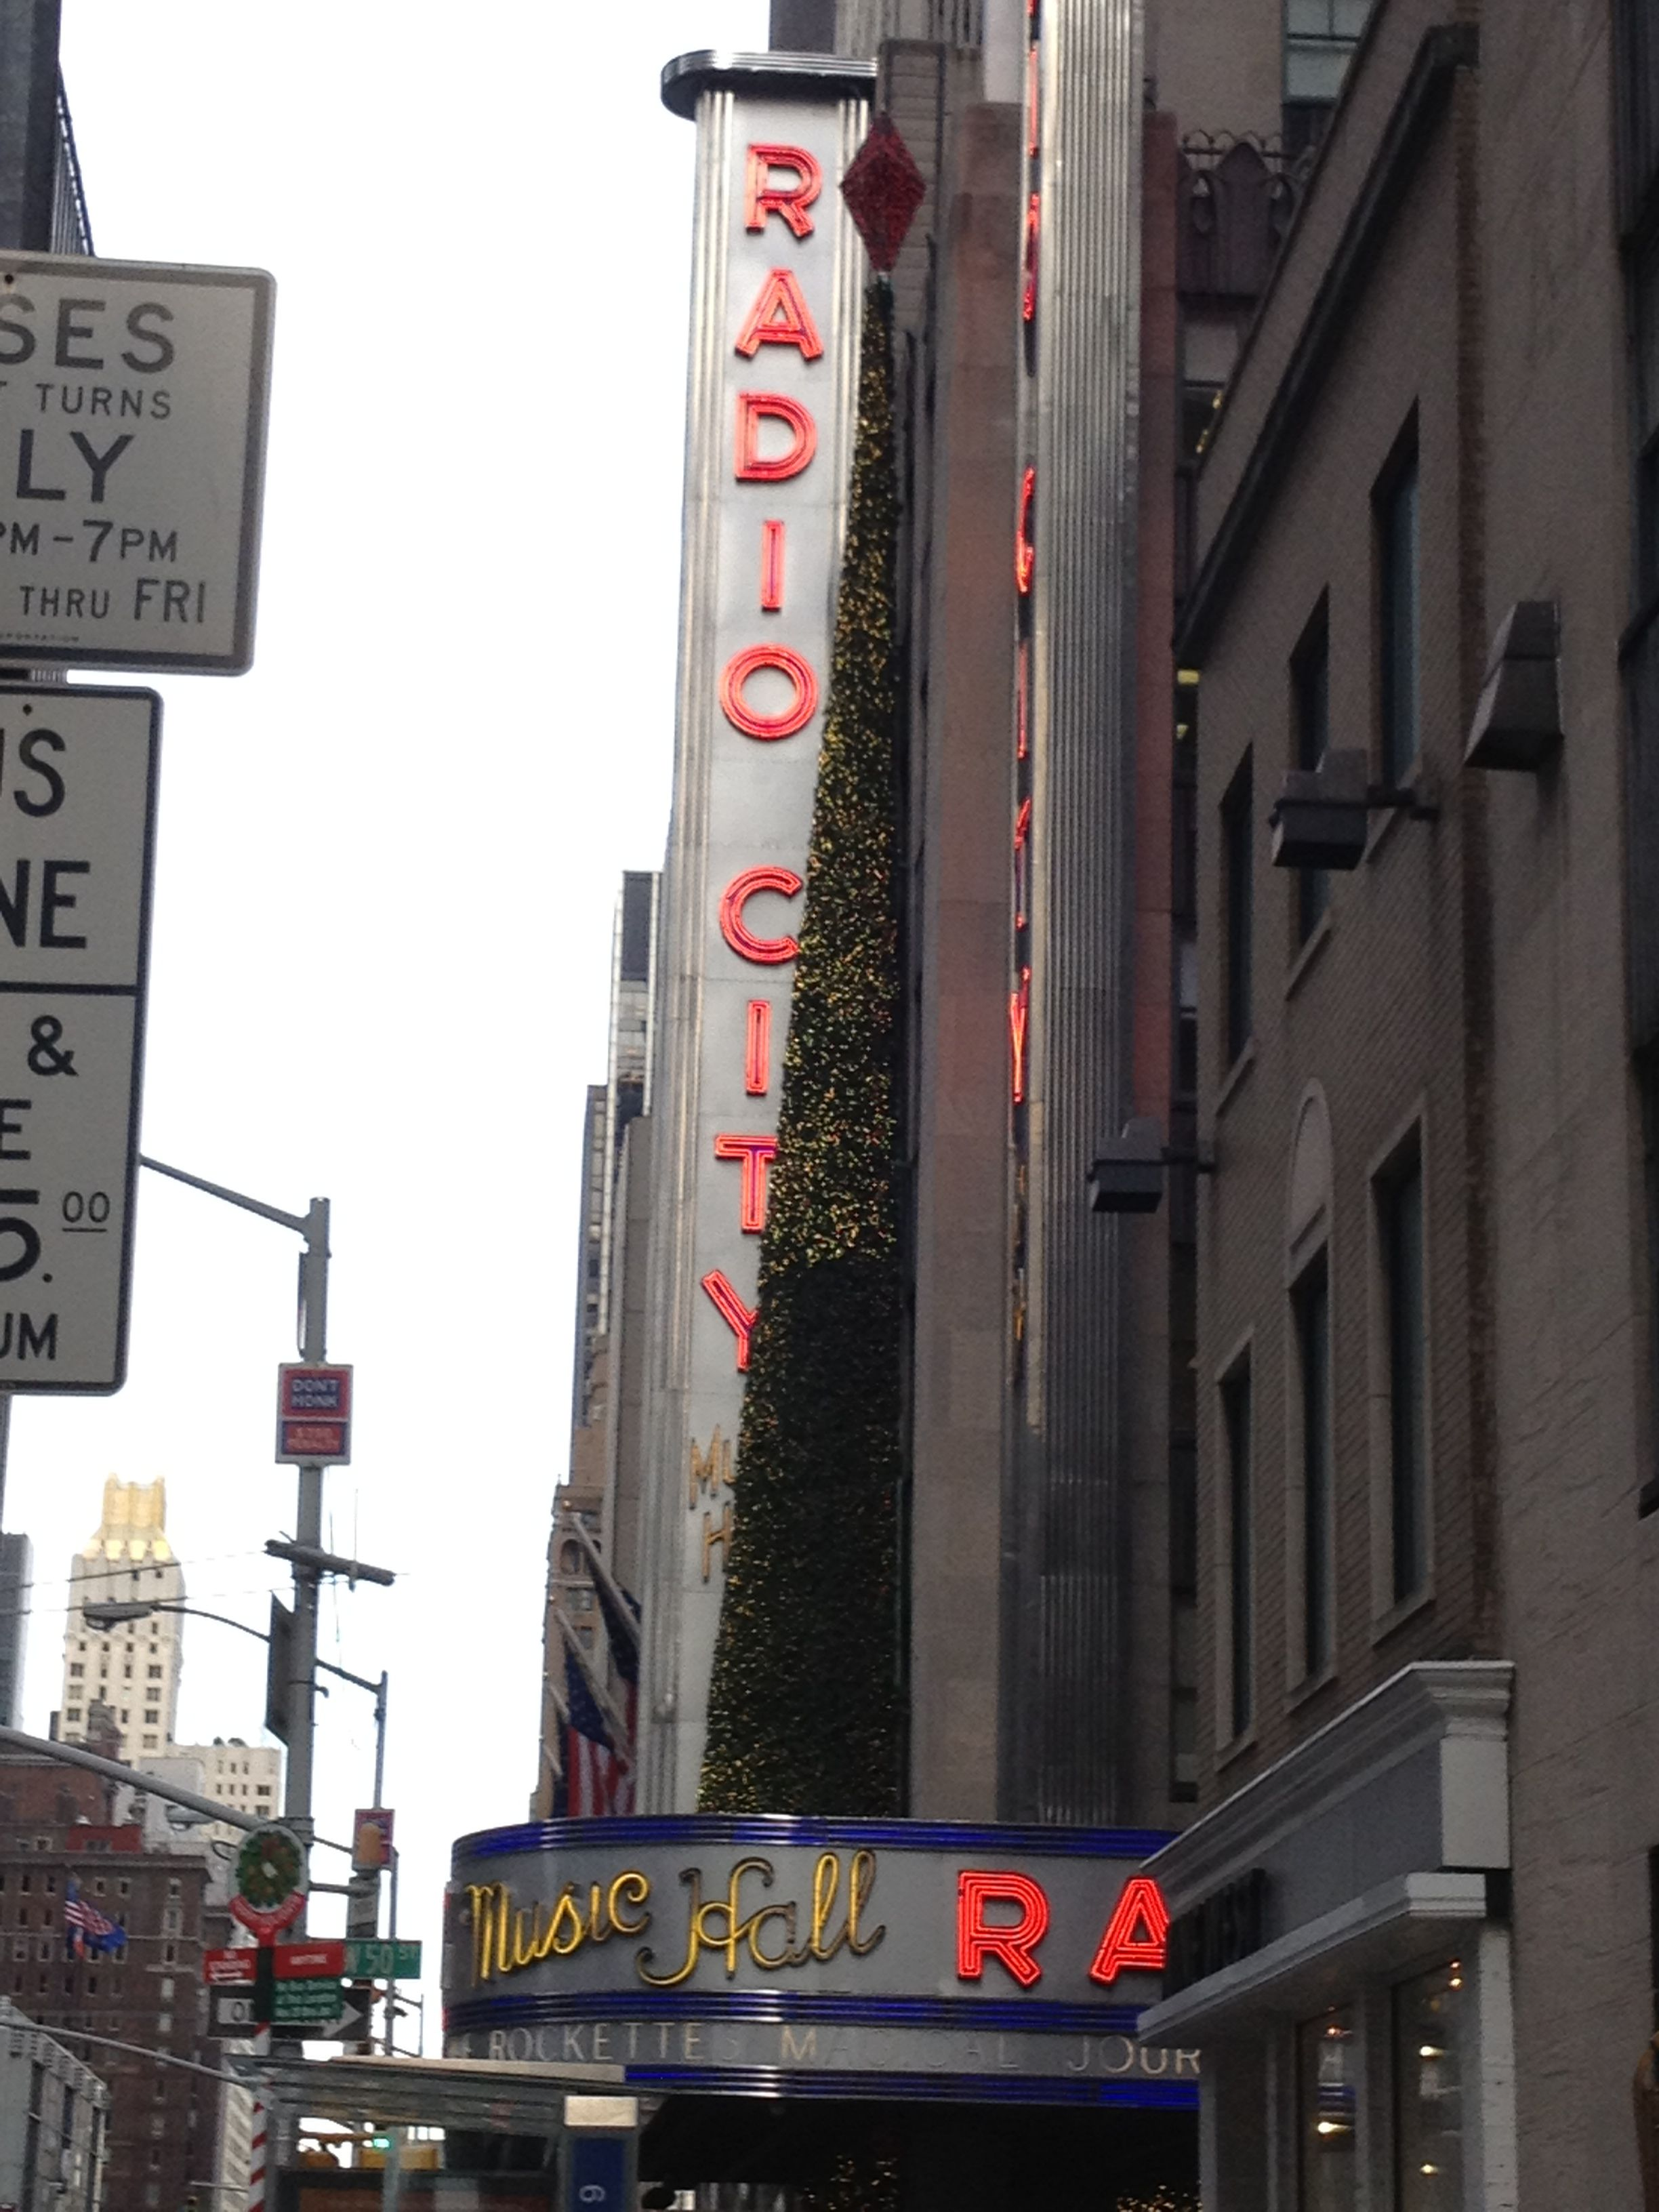 Radio City Hall - Times Square | Times square, City hall